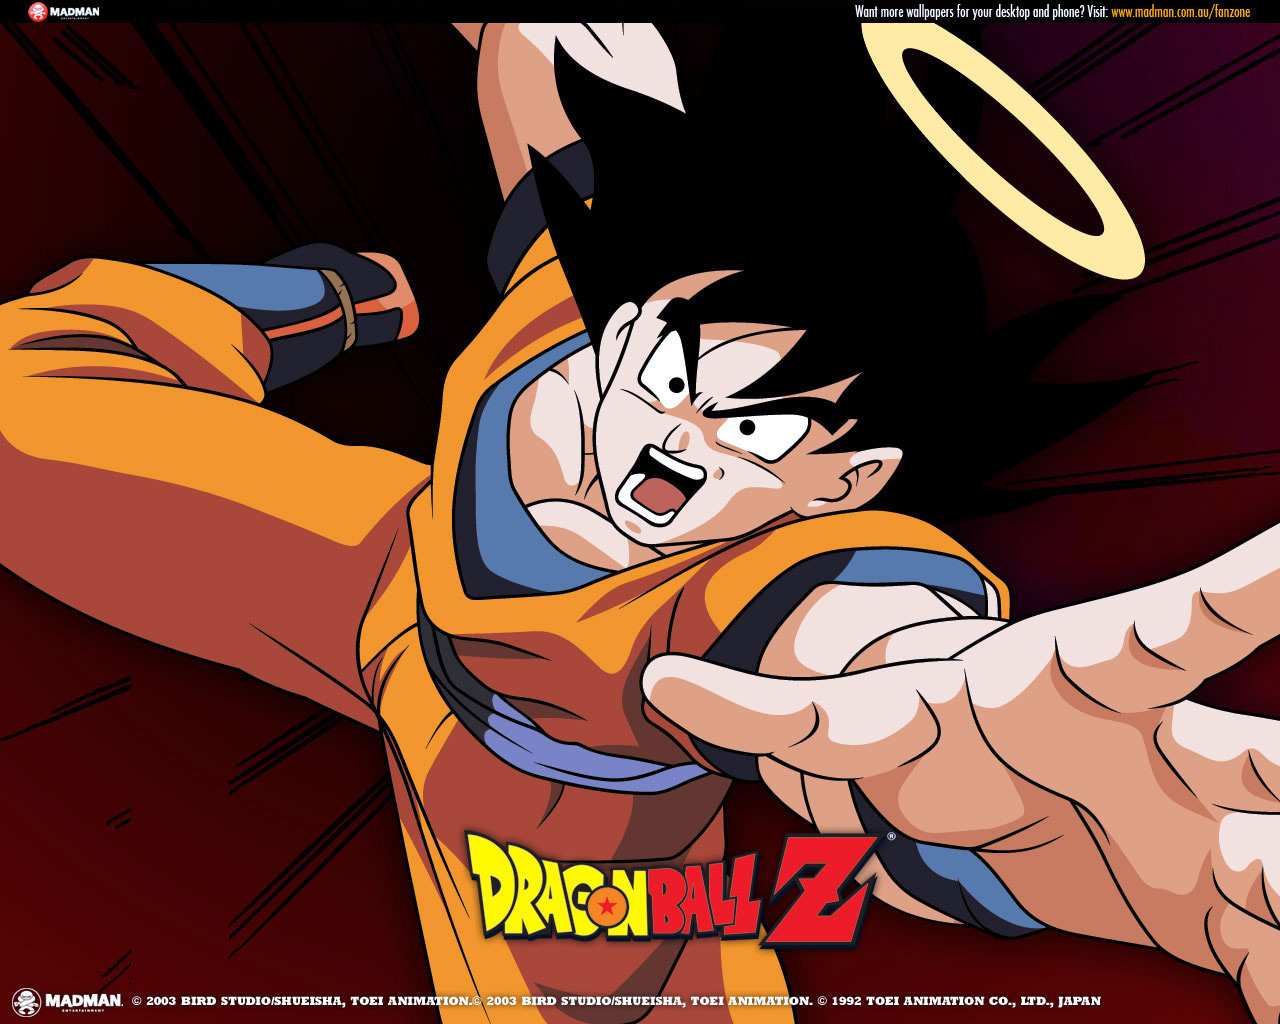 Imagenes de los Personajes de Dragon Ball-Z-GT - Taringa!